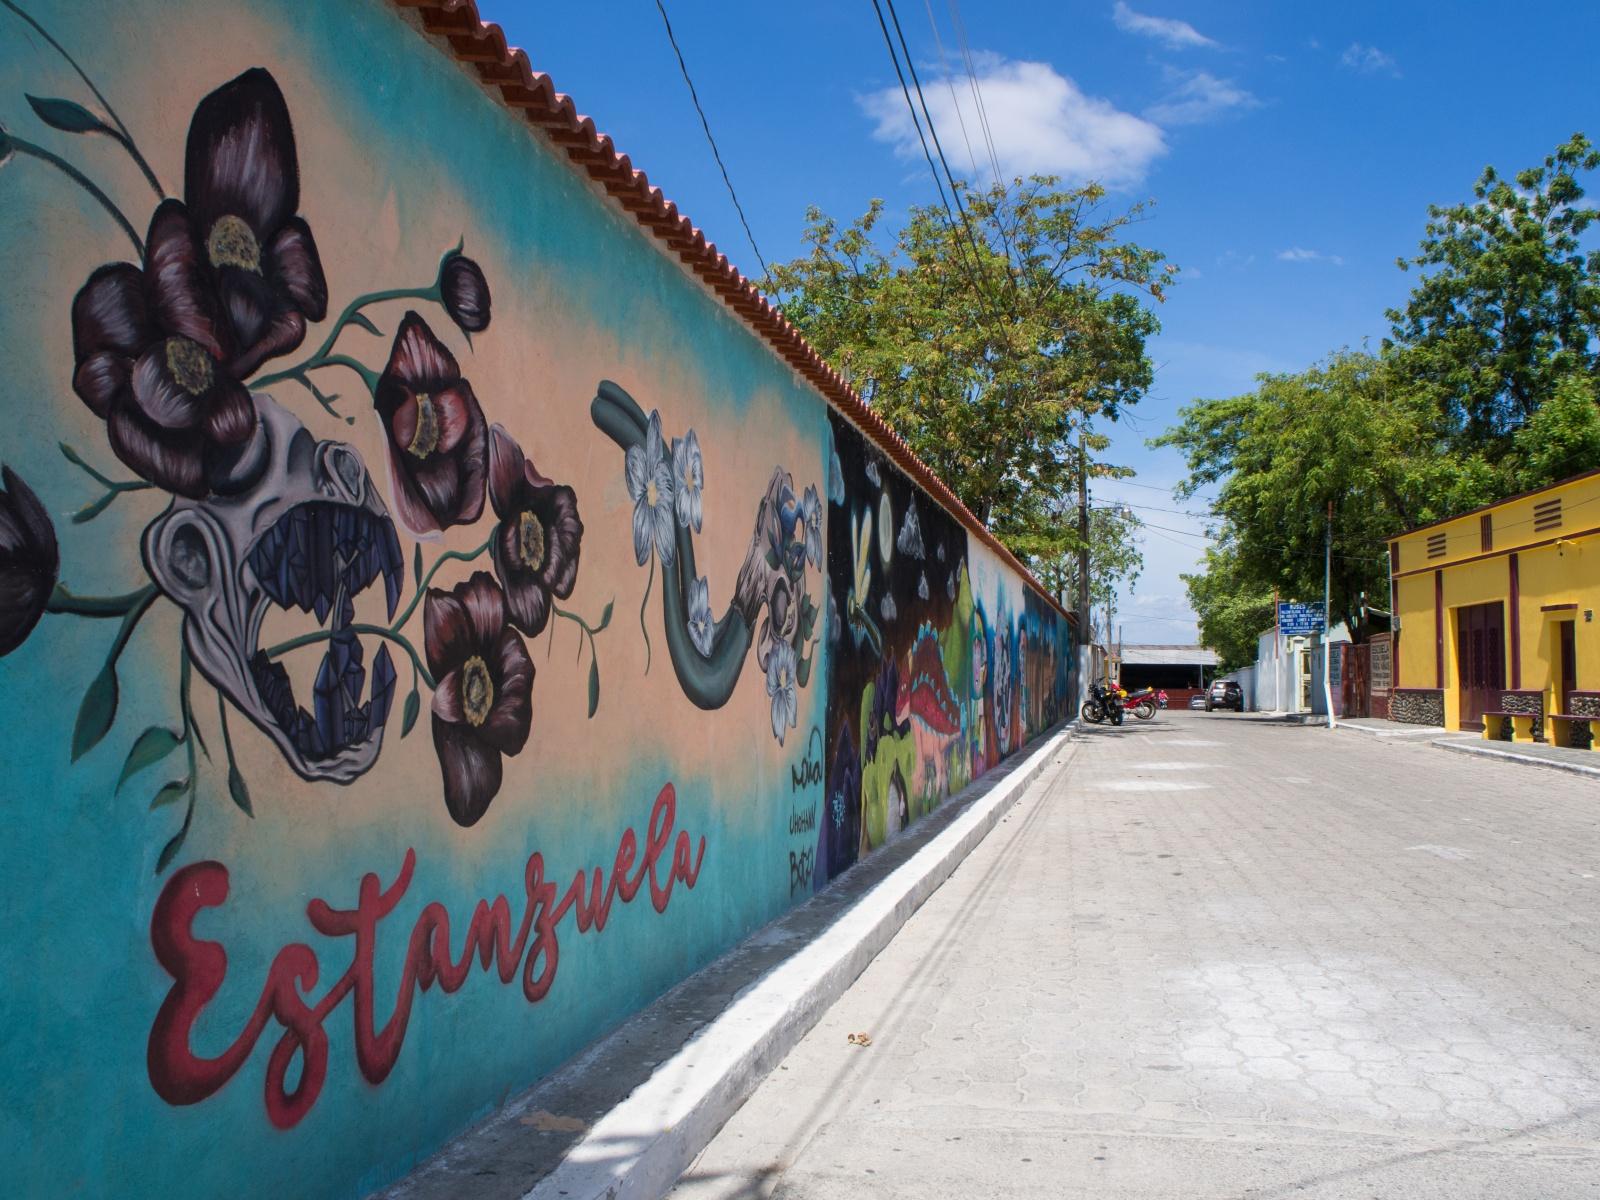 ESTANZUELA, GUATEMALA - AUGUST 2018